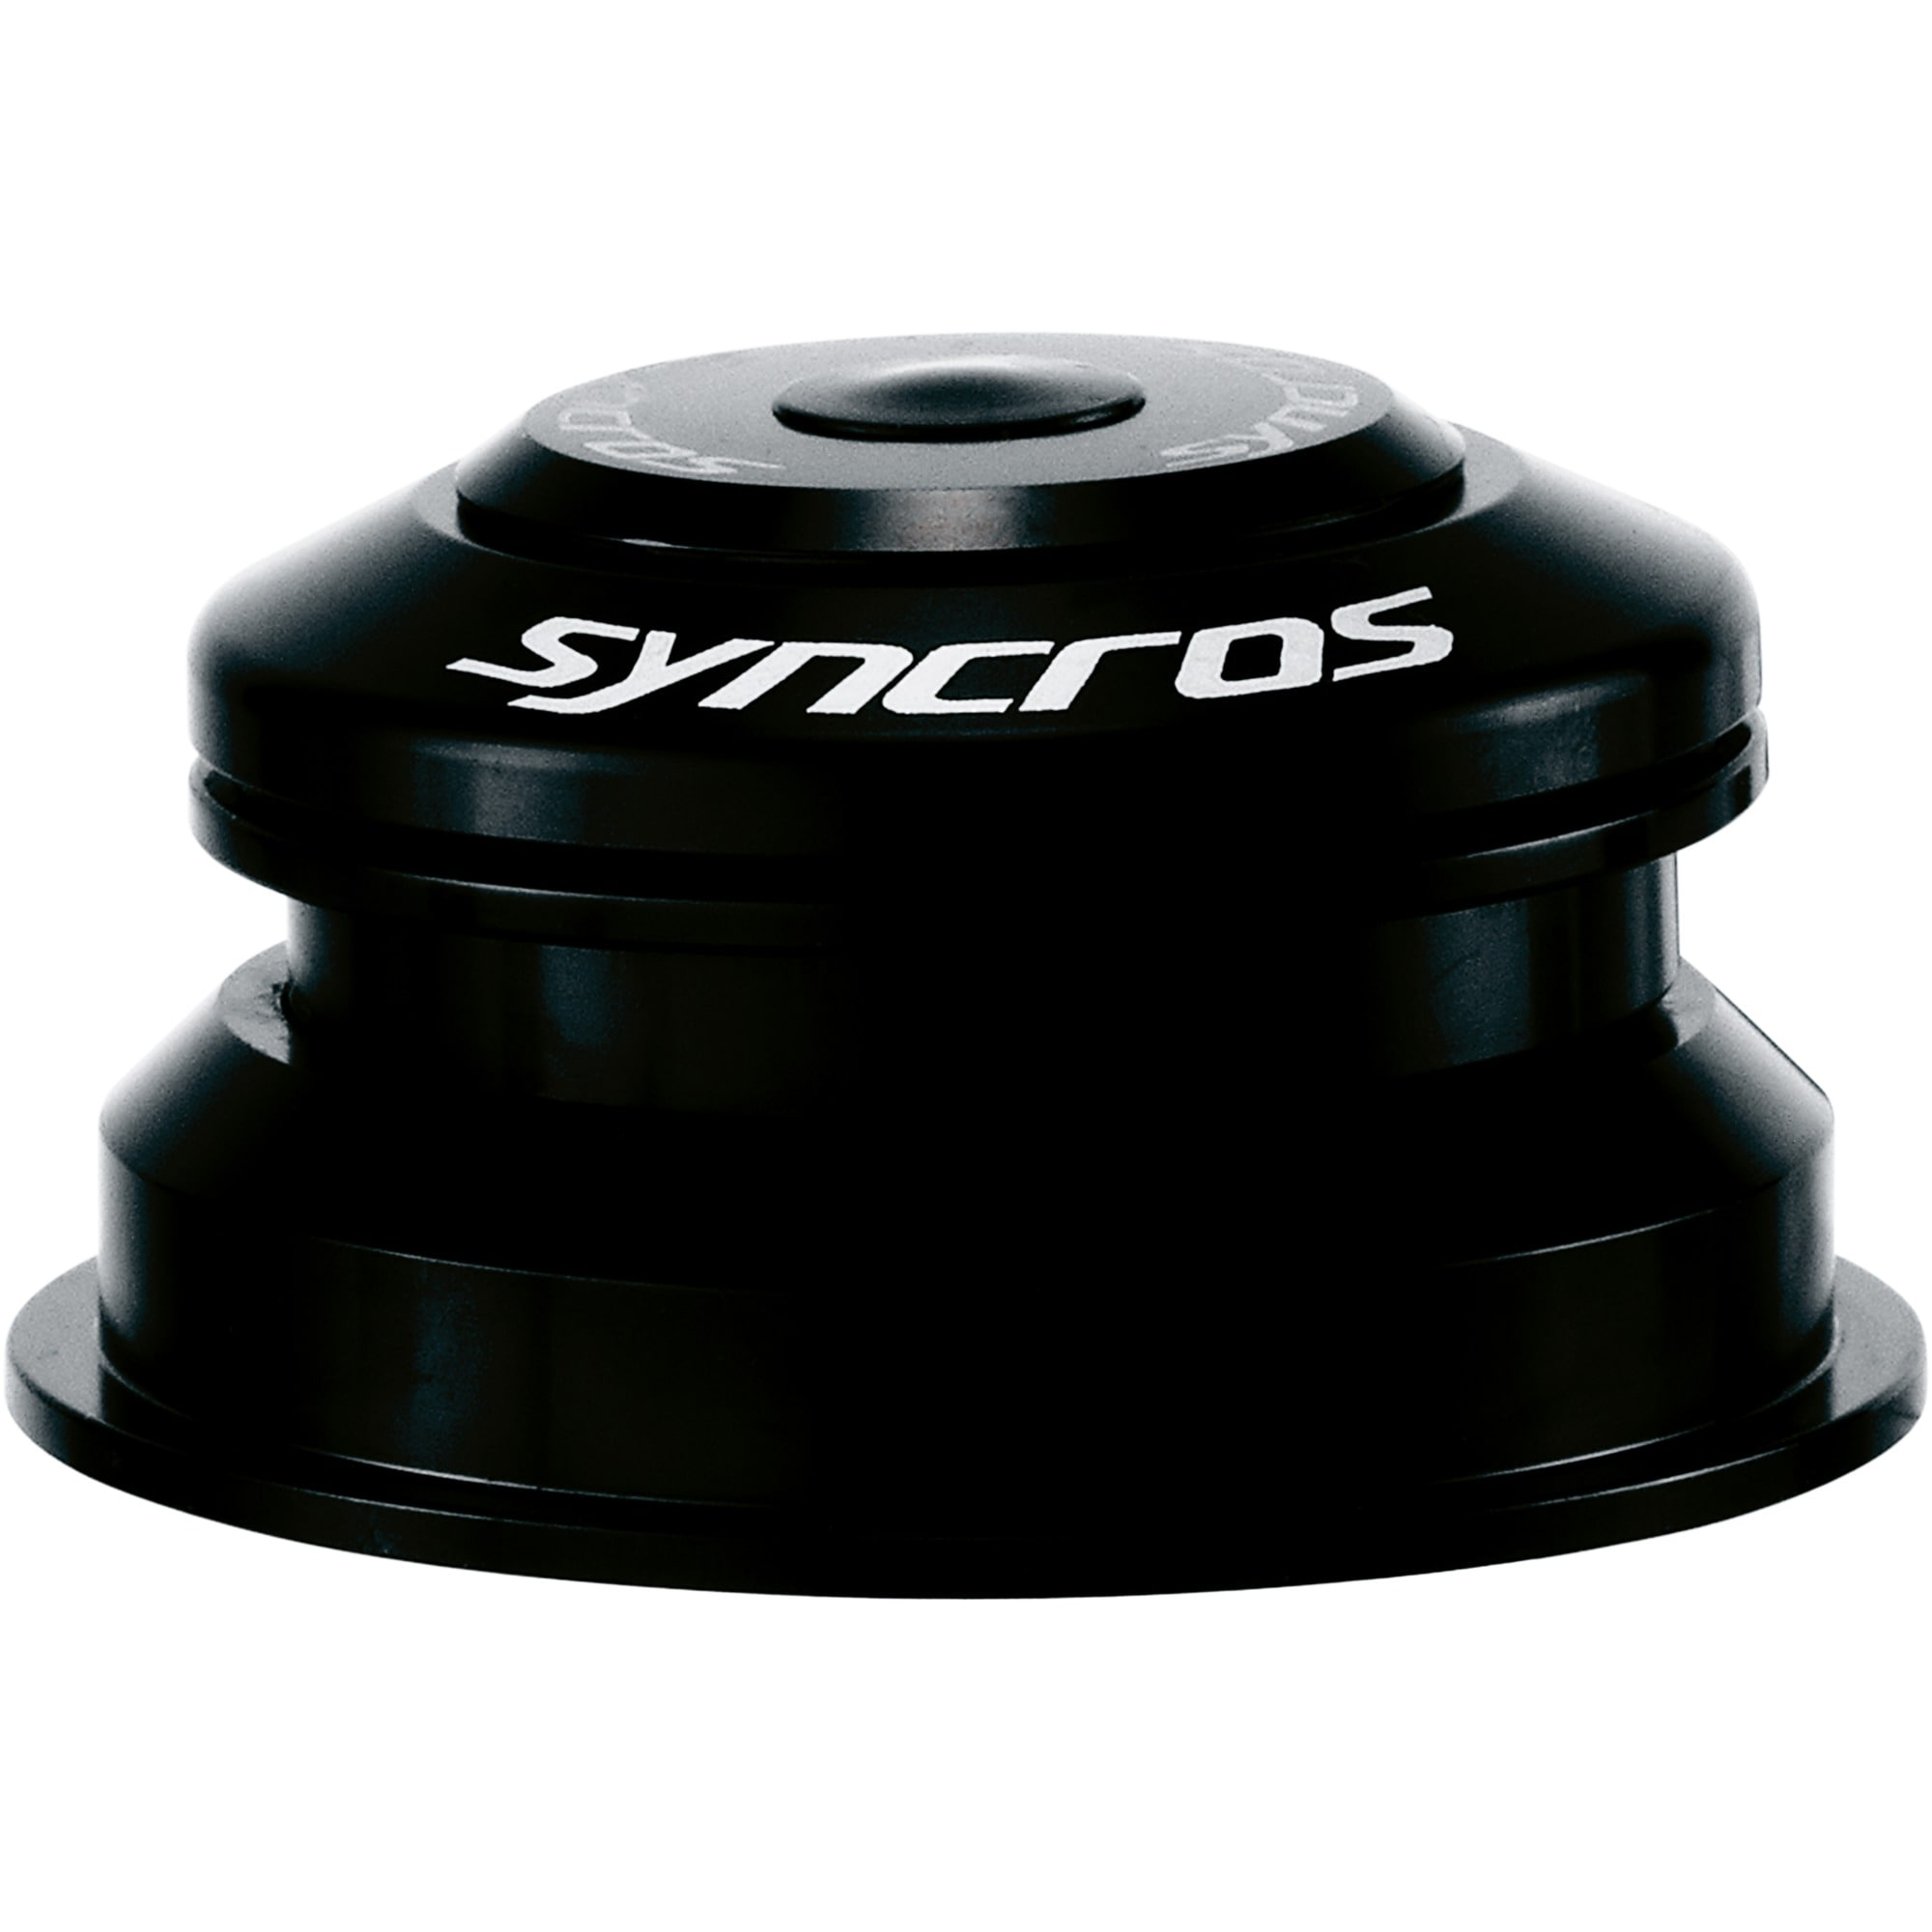 "Syncros StyrLager, PressFit, 1 1/8-1 1/4"""